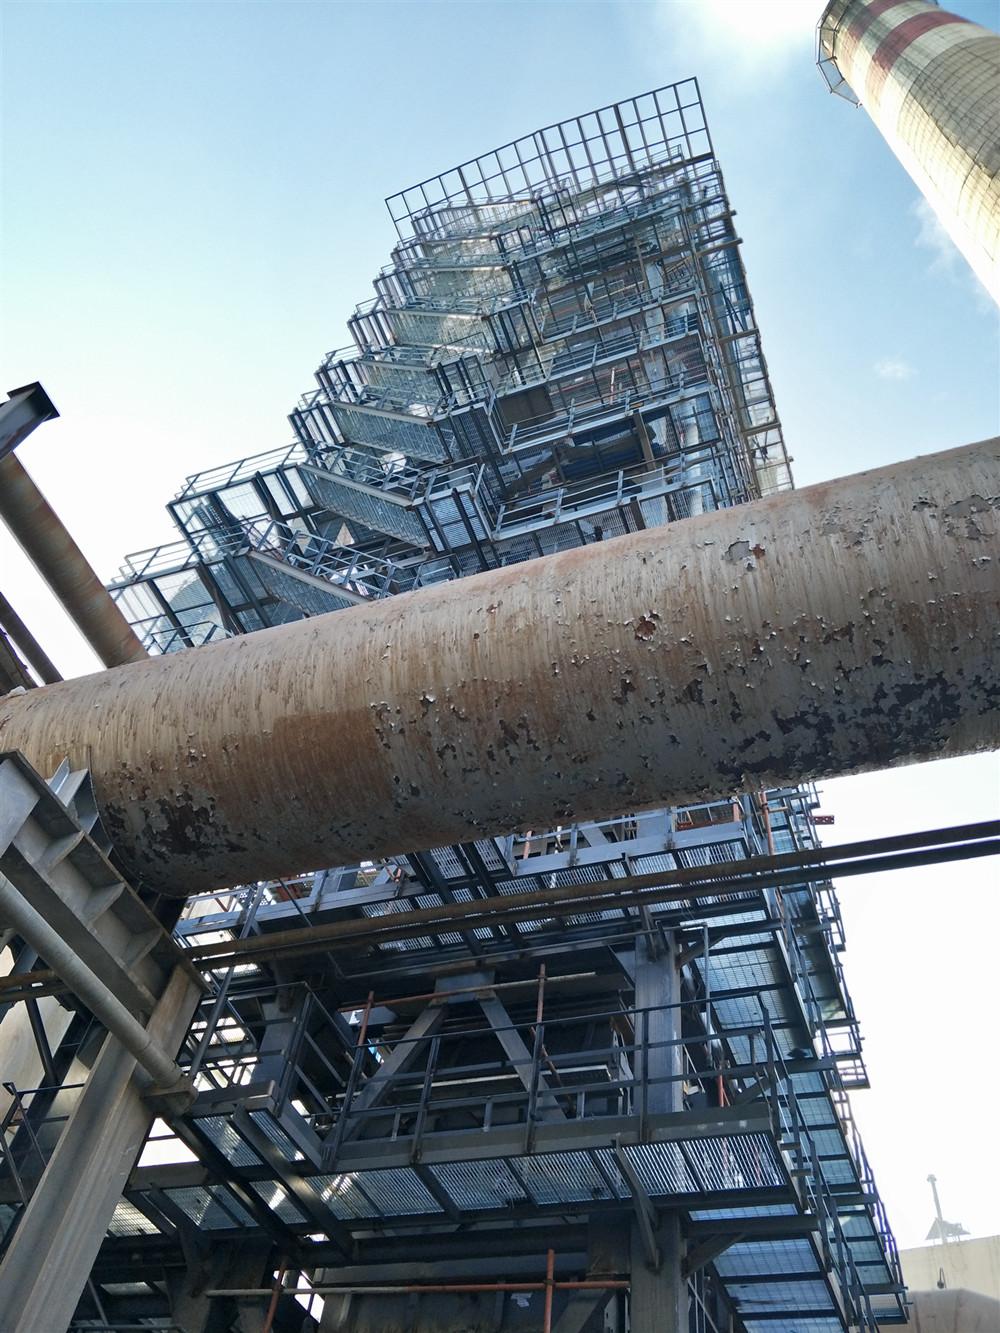 6349G陕西延长石油集团有限责任公司永坪炼油厂120万吨/年催化装置烟气脱硝项目余热锅炉